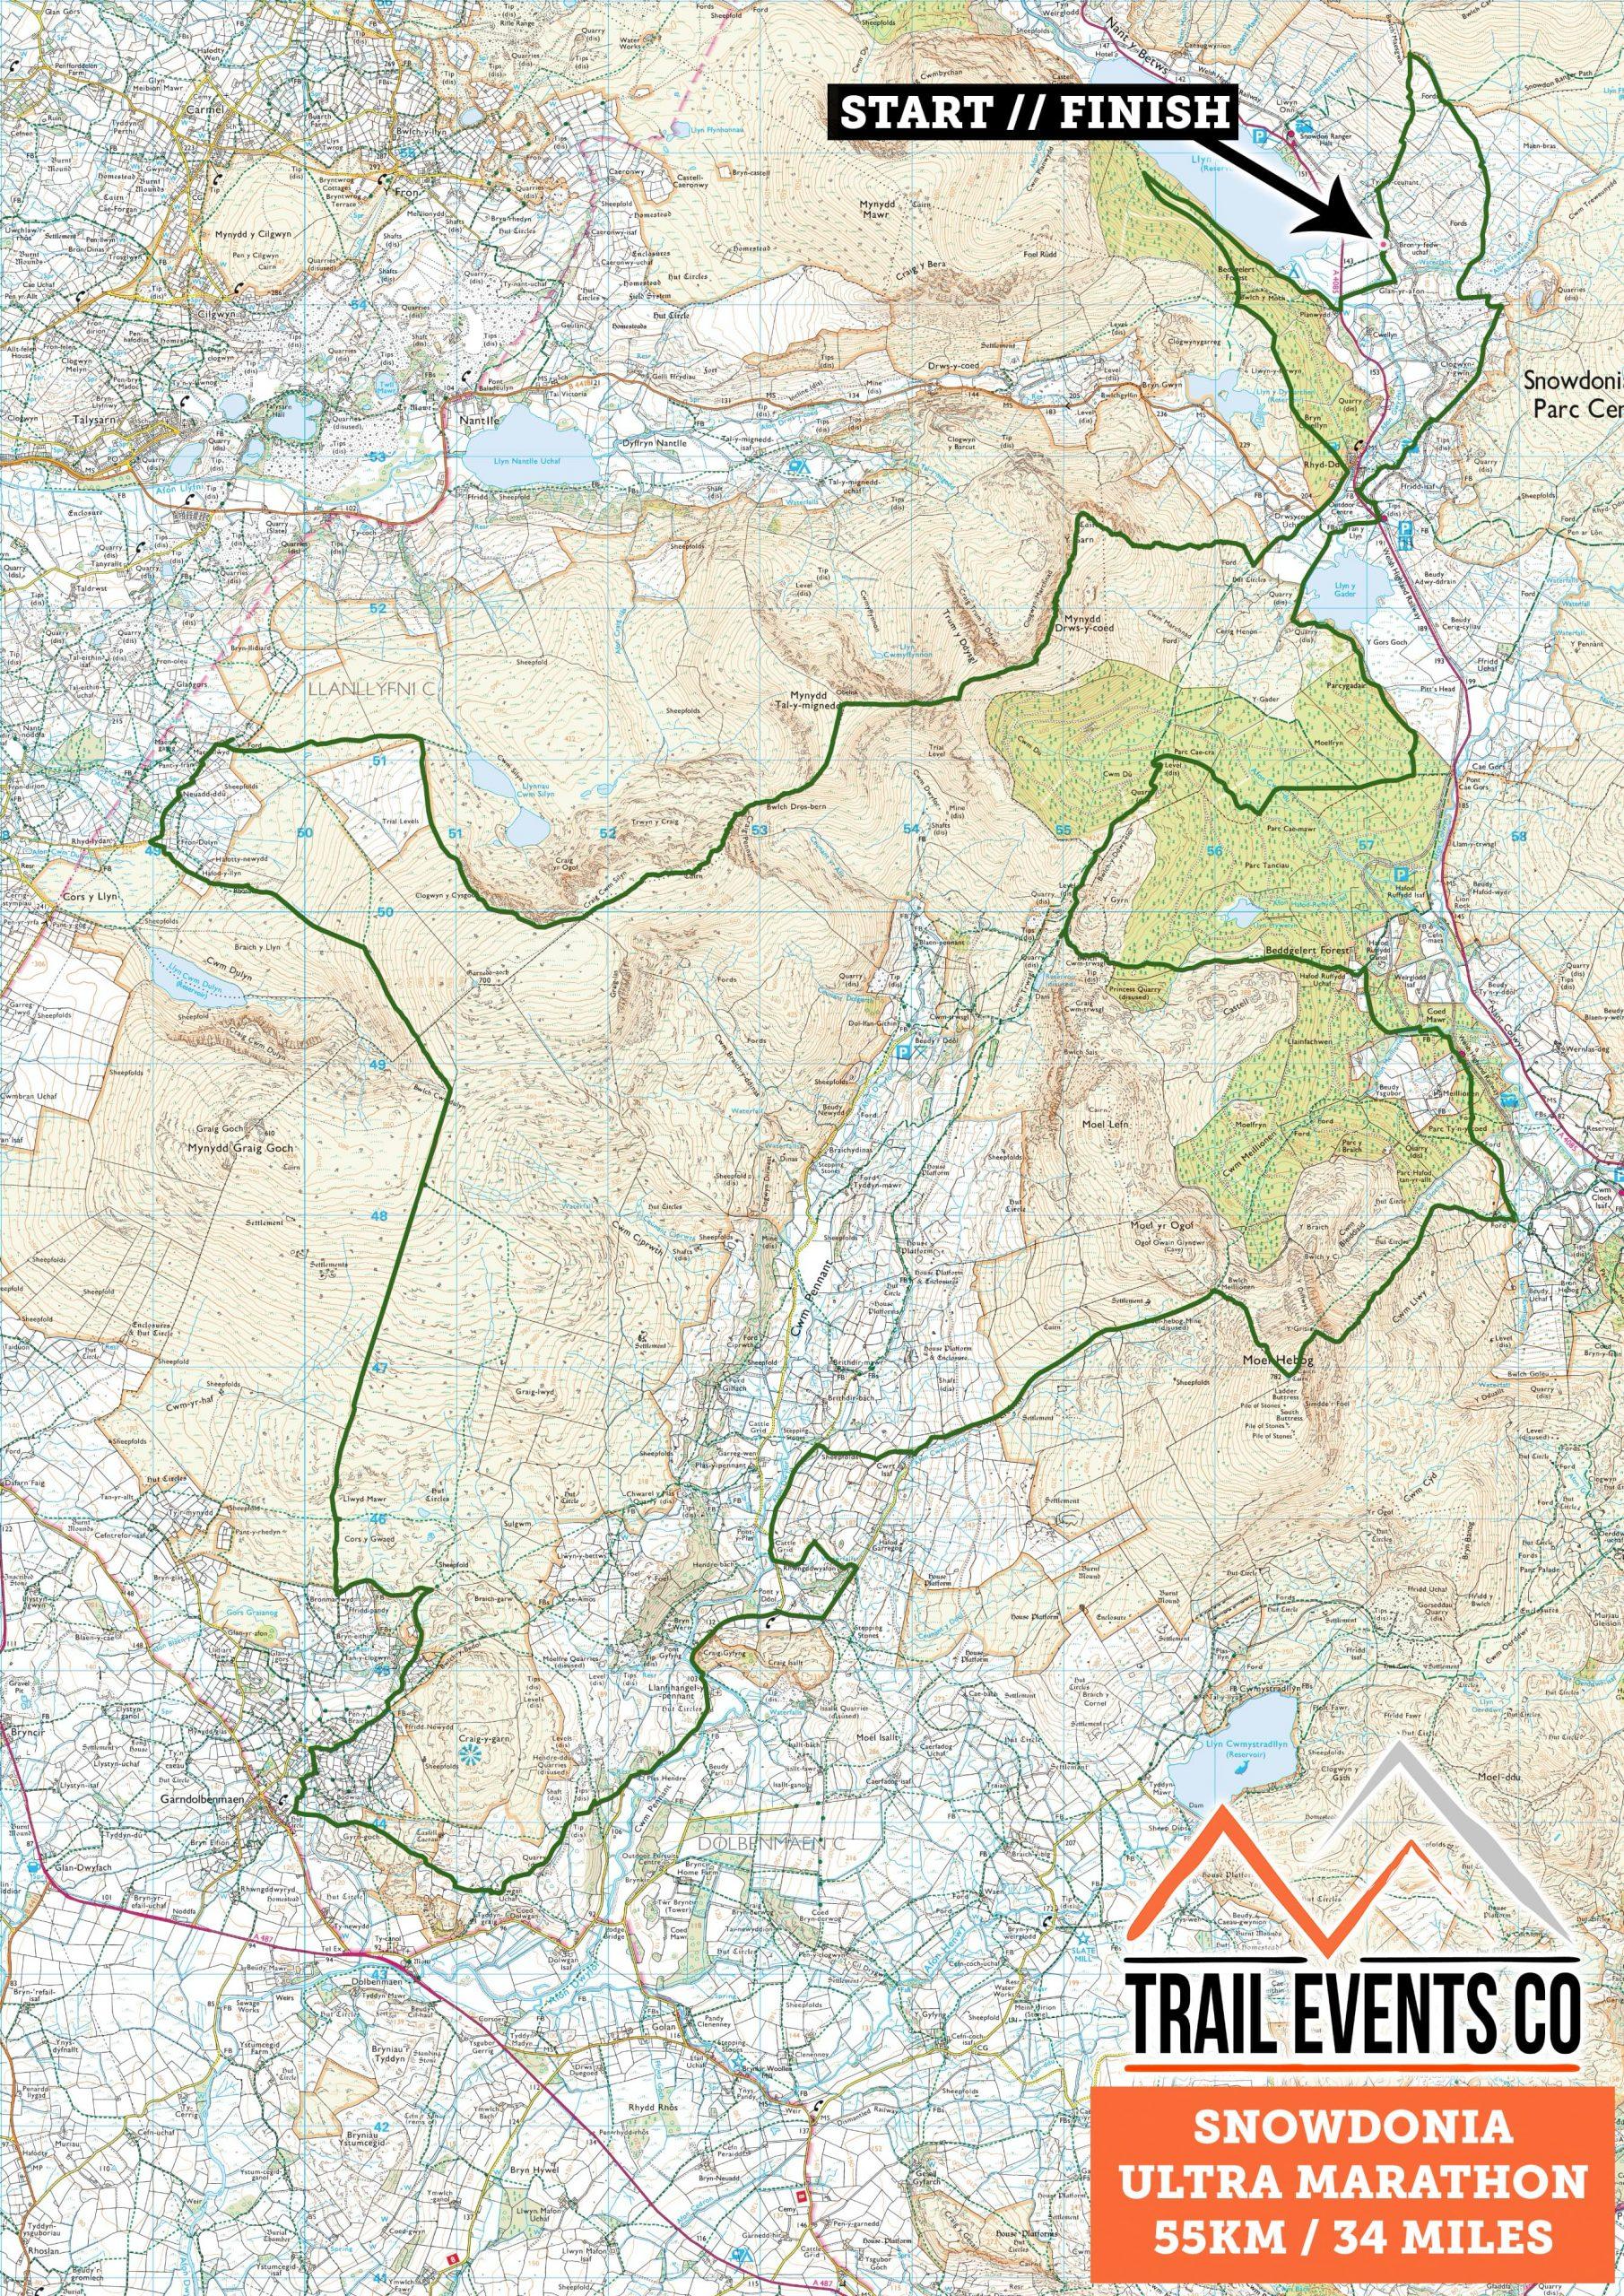 Snowdonia Ultra Marathon